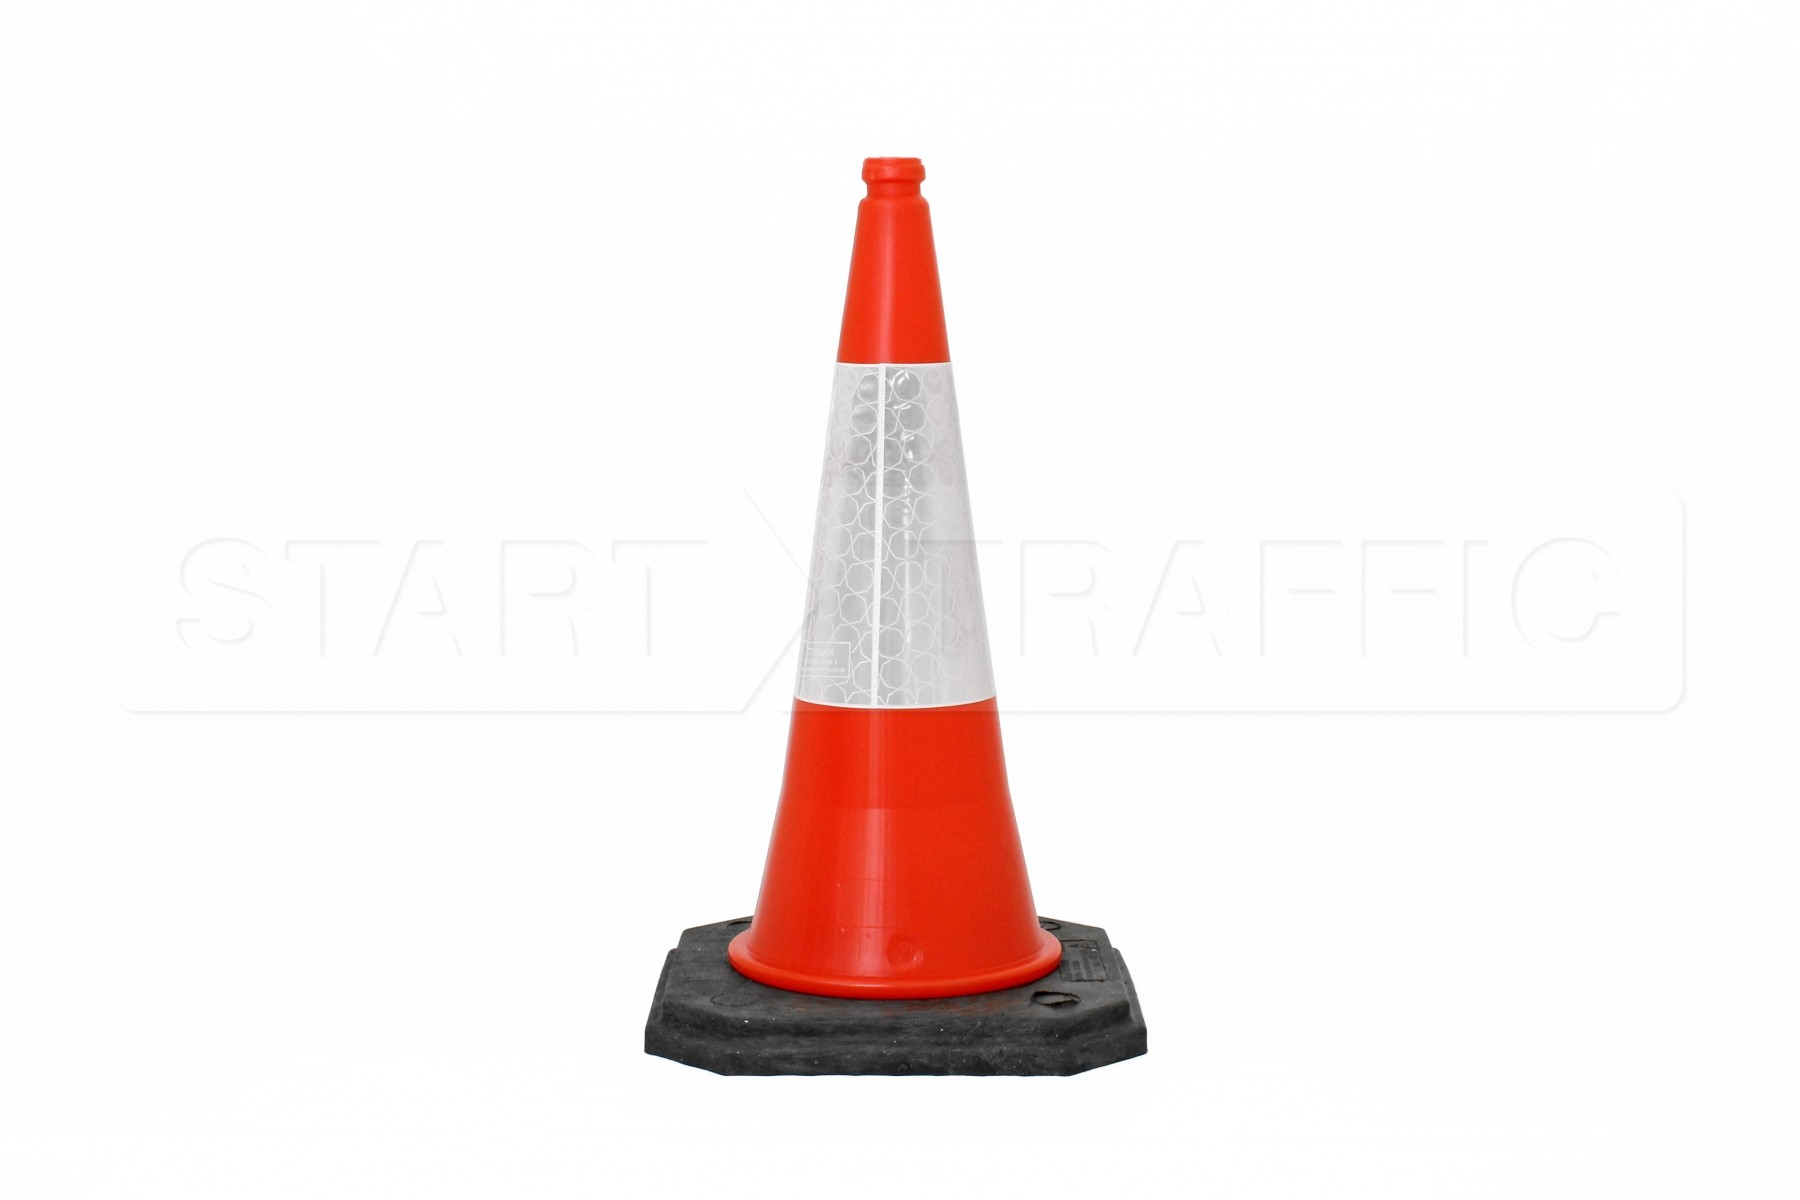 Singgle traffic cone photo